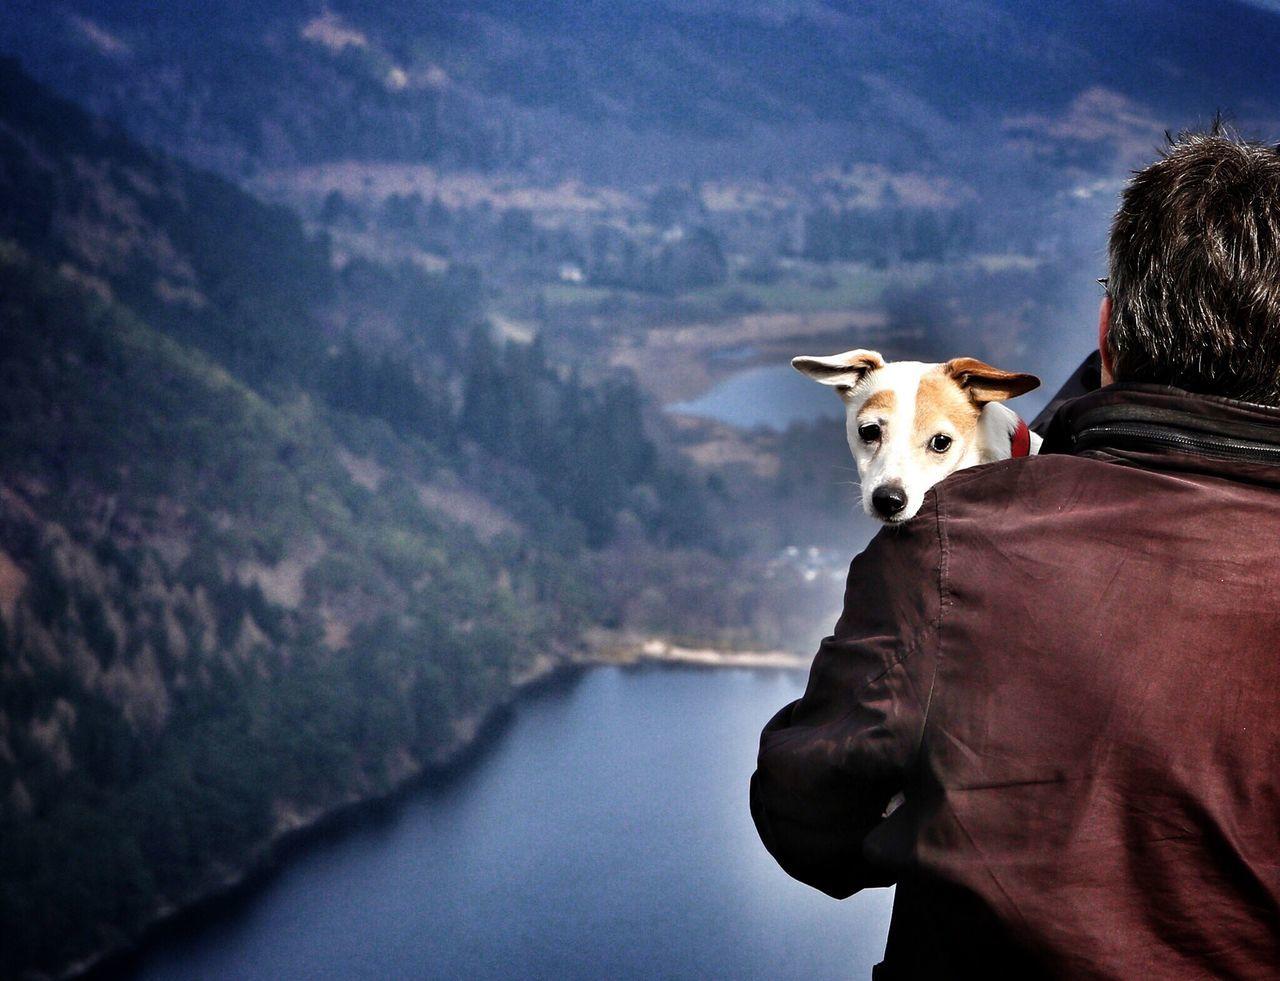 Don't look down. Dog Nature On Your Doorstep Doglover EyeEm Animal Lover Animal Photography Irelandinspires EyeEm Nature Lover